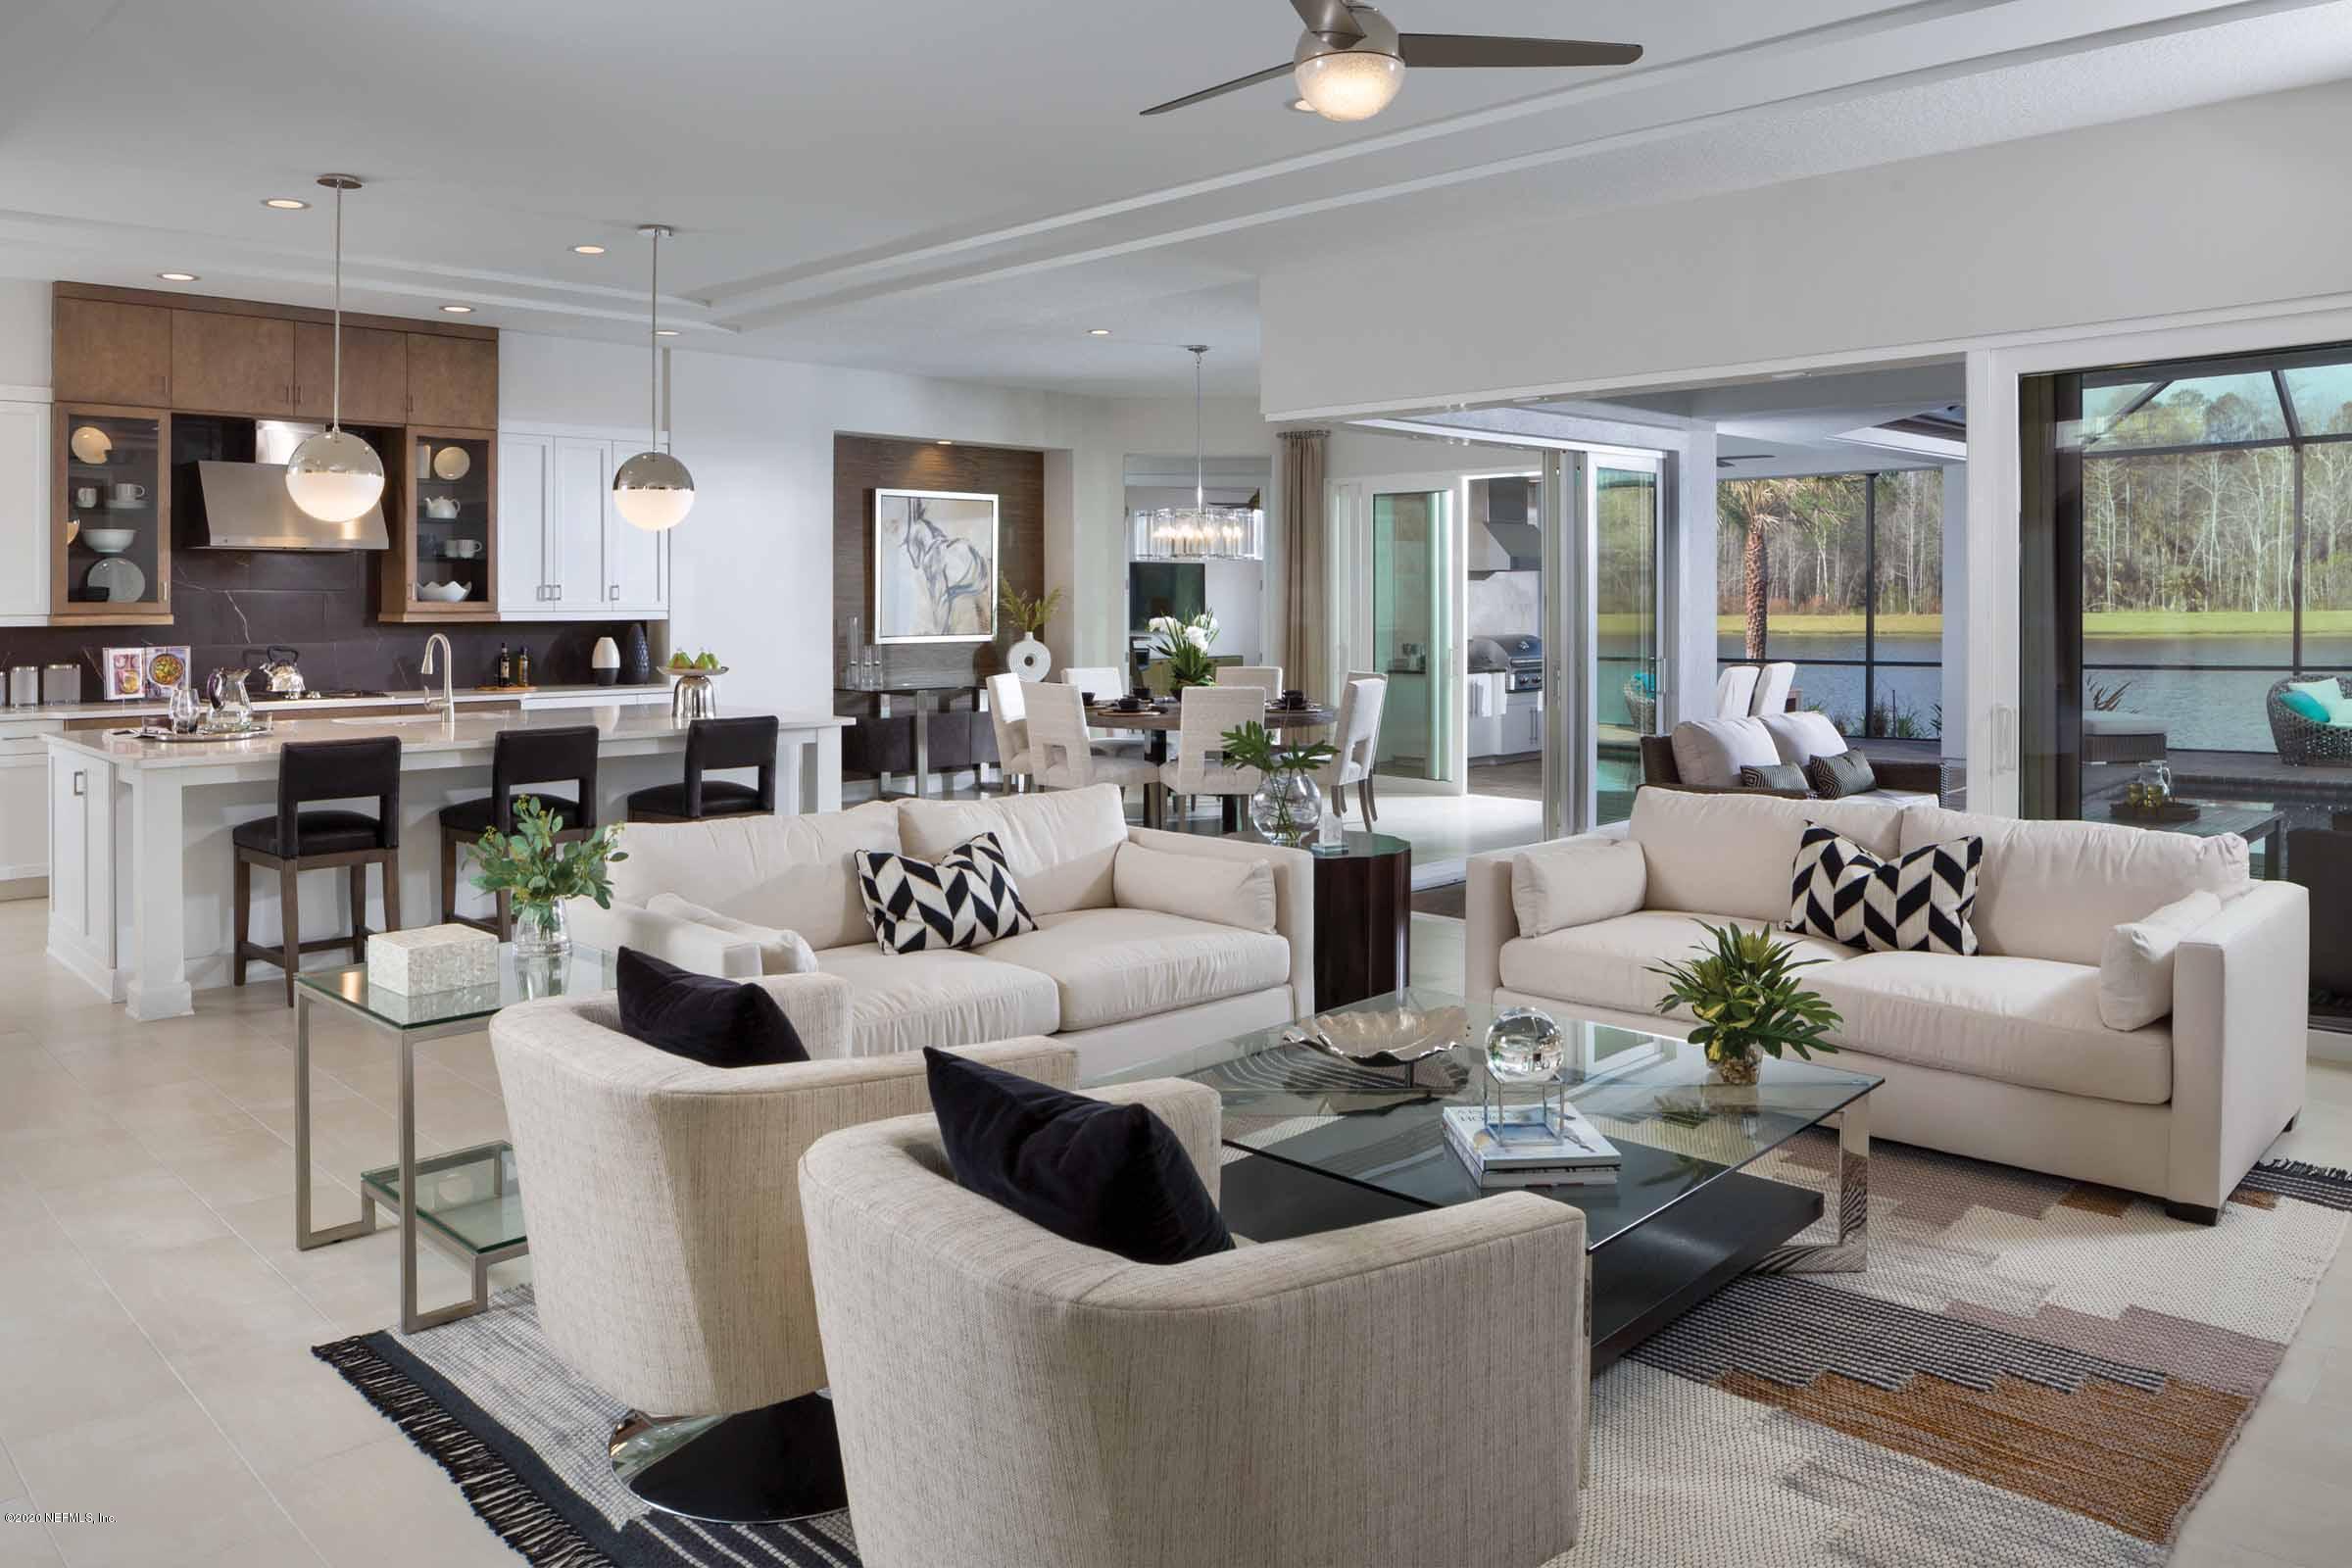 27 WARDEN, ST AUGUSTINE, FLORIDA 32095, 3 Bedrooms Bedrooms, ,3 BathroomsBathrooms,Residential,For sale,WARDEN,1082238